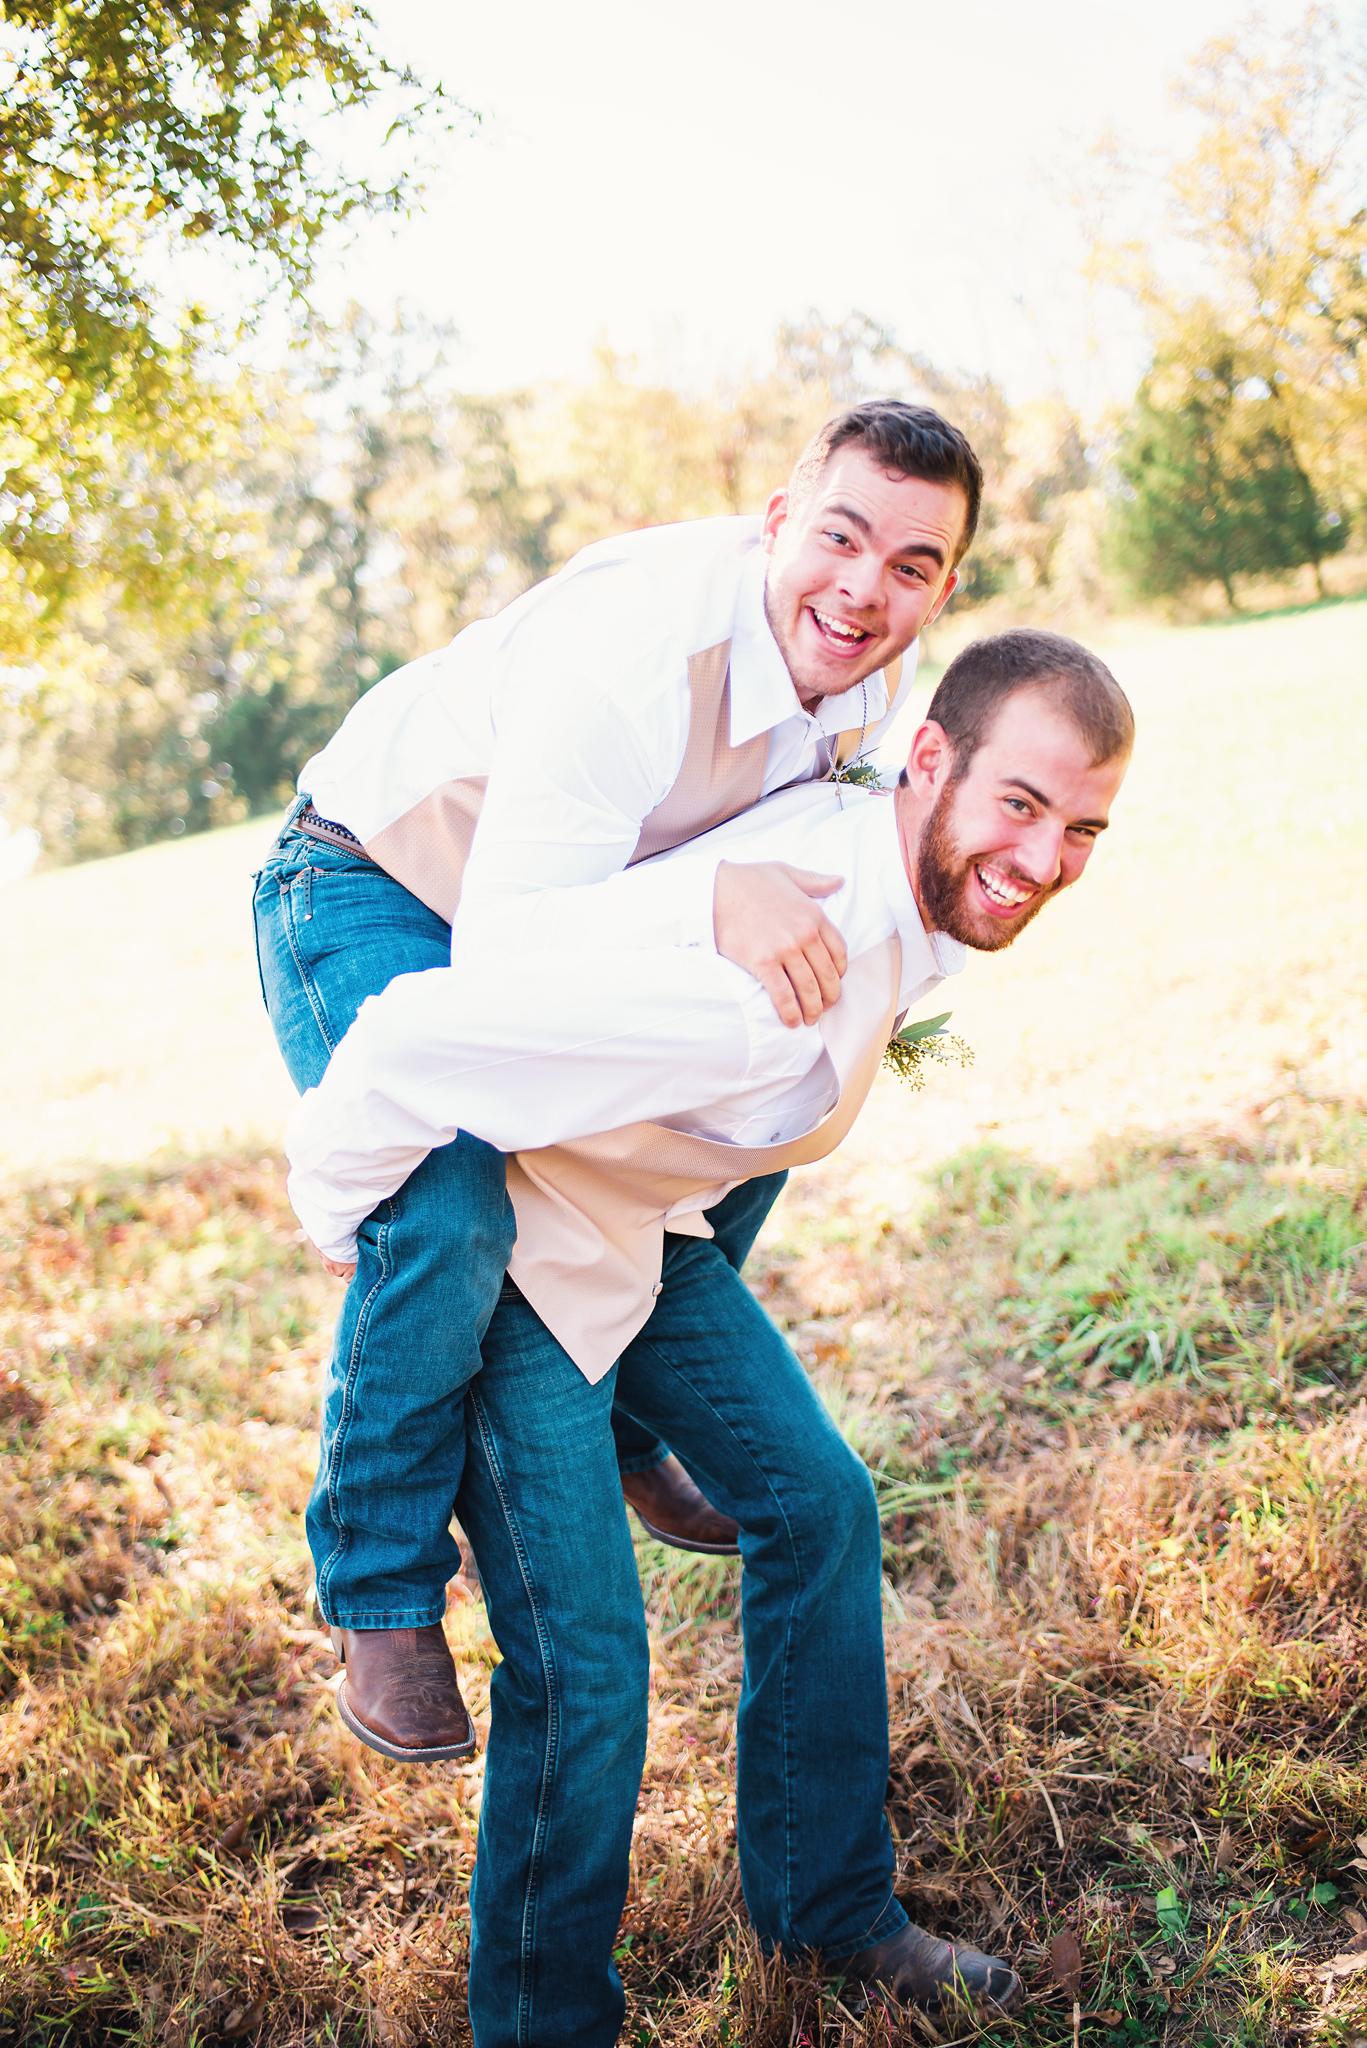 Cayla and Nick Country Wedding Hermann Missouri Cody Krogman Photography Saint Louis and Chicago Destination Wedding Photographer (183 of 995)